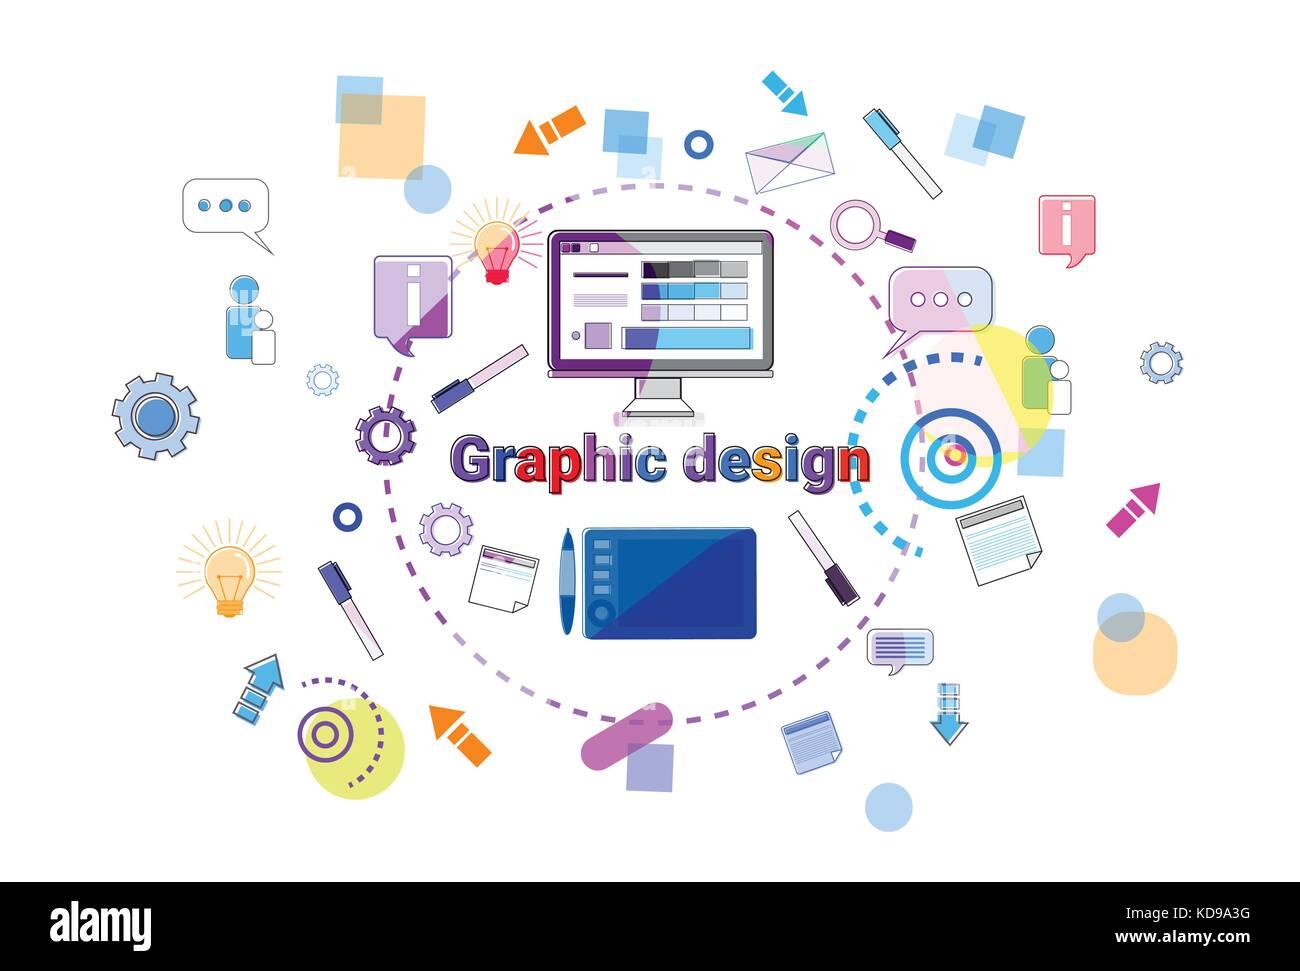 Graphic Design Idea Concept Creative Process Web Development Stock Vector Image Art Alamy